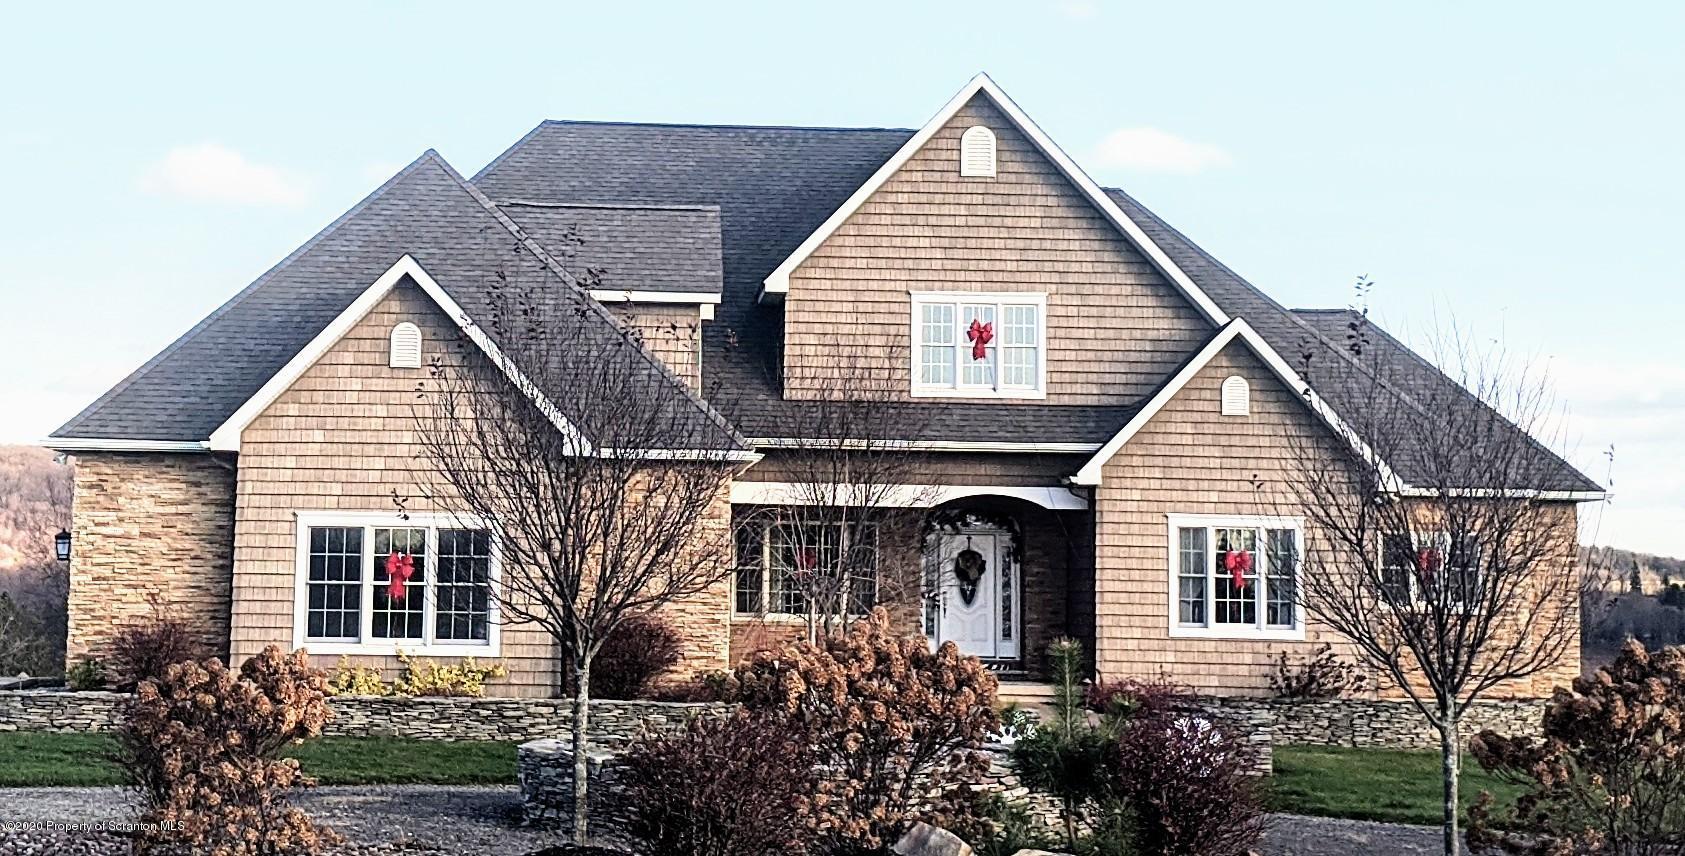 124 Sandy Bank Rd, Greenfield Twp, Pennsylvania 18407, 5 Bedrooms Bedrooms, 16 Rooms Rooms,4 BathroomsBathrooms,Single Family,For Sale,Sandy Bank,20-3137